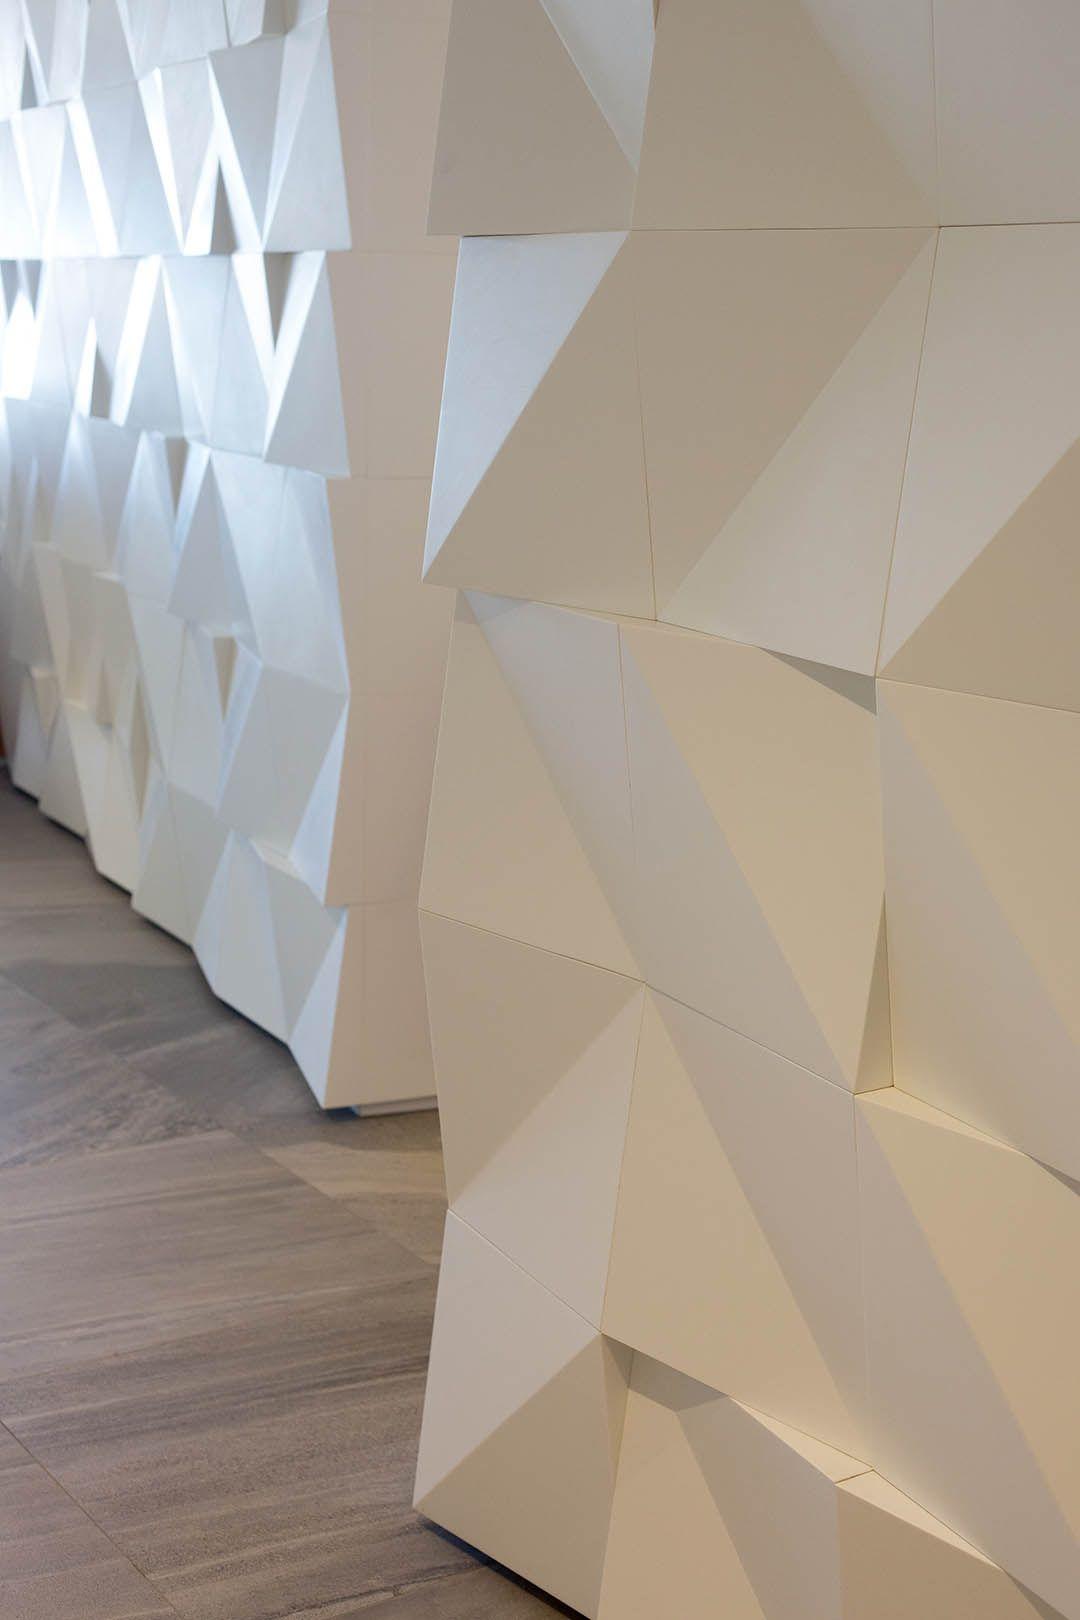 Aon Office Fitout Corian Corian Corian Solid Surface Wall